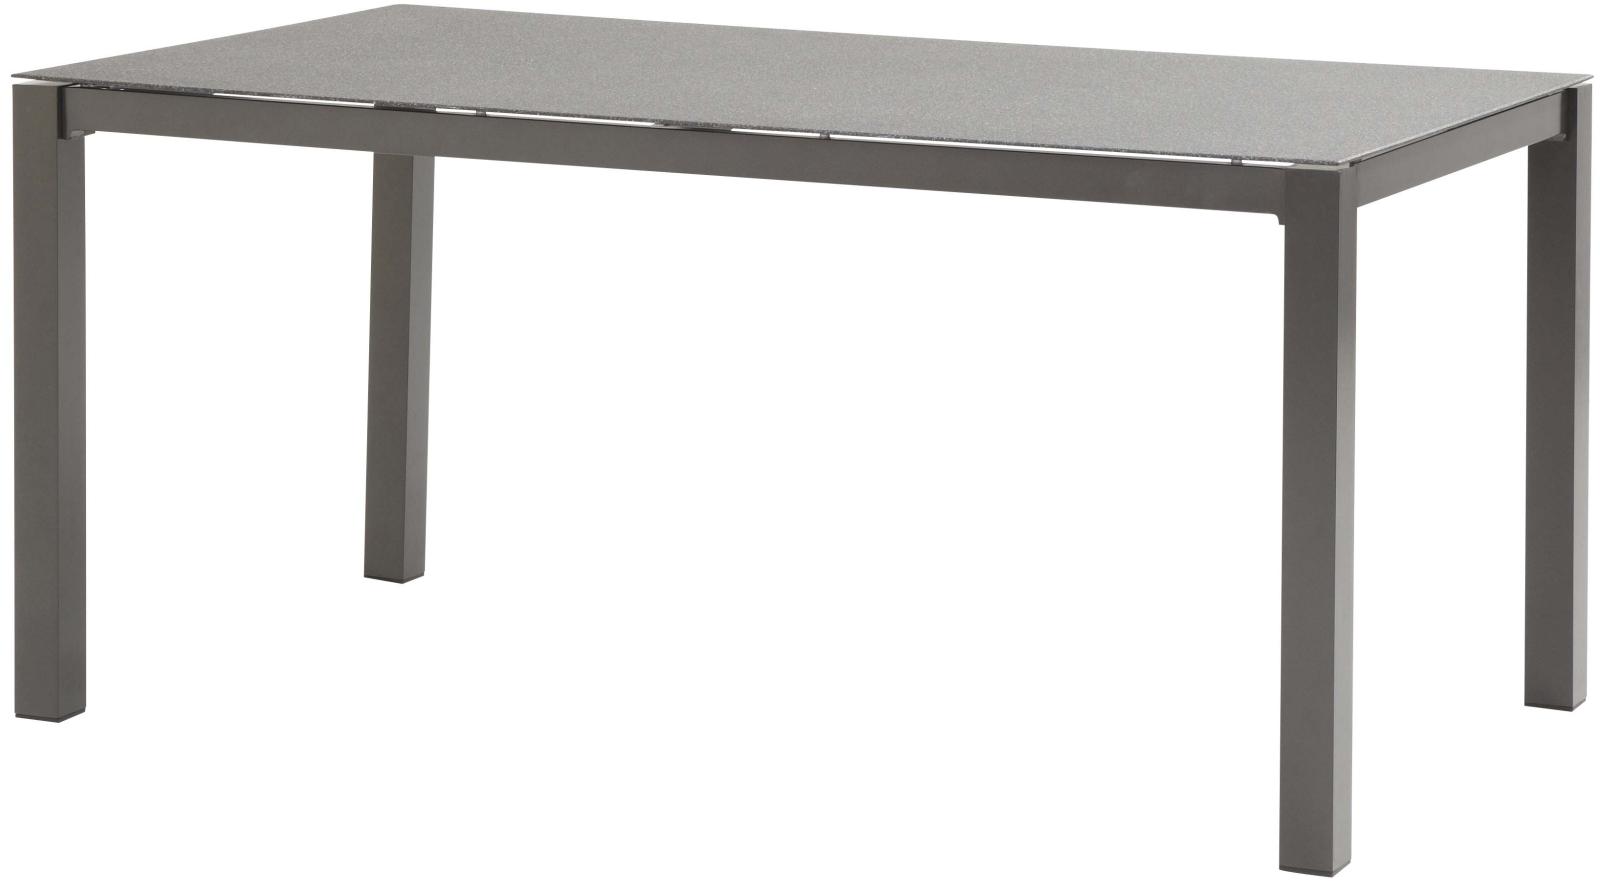 Záhradný stôl - Doppler - Firenze - 259FI11122